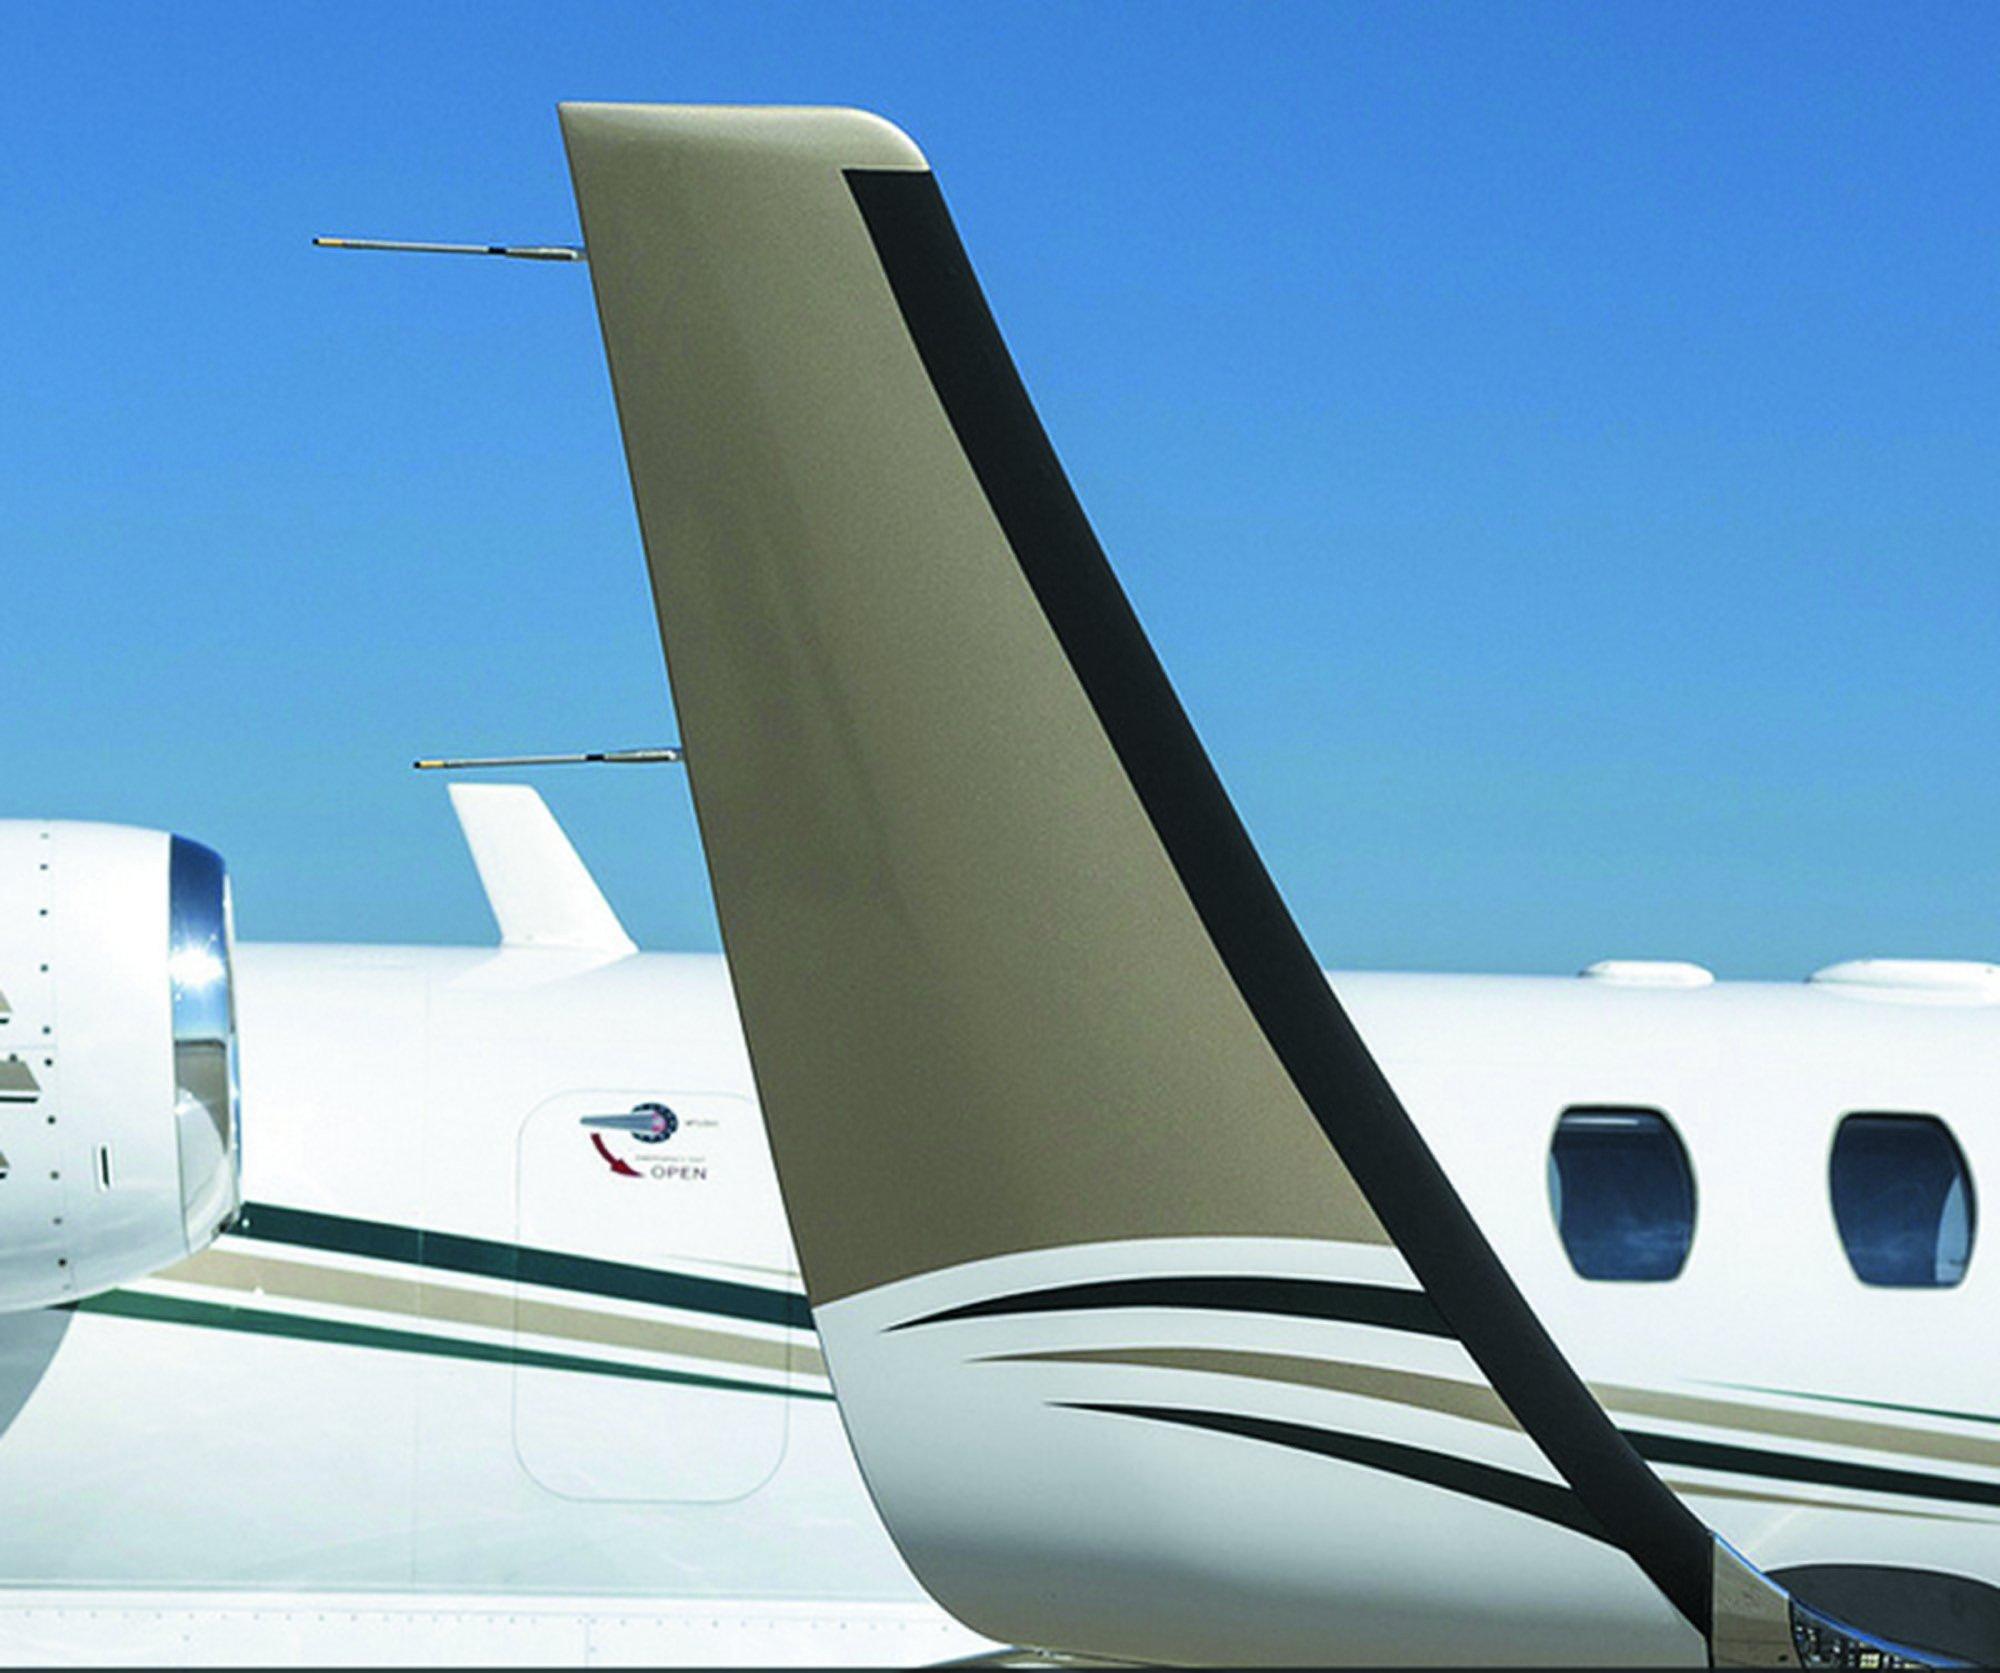 2 Tamarack winglet